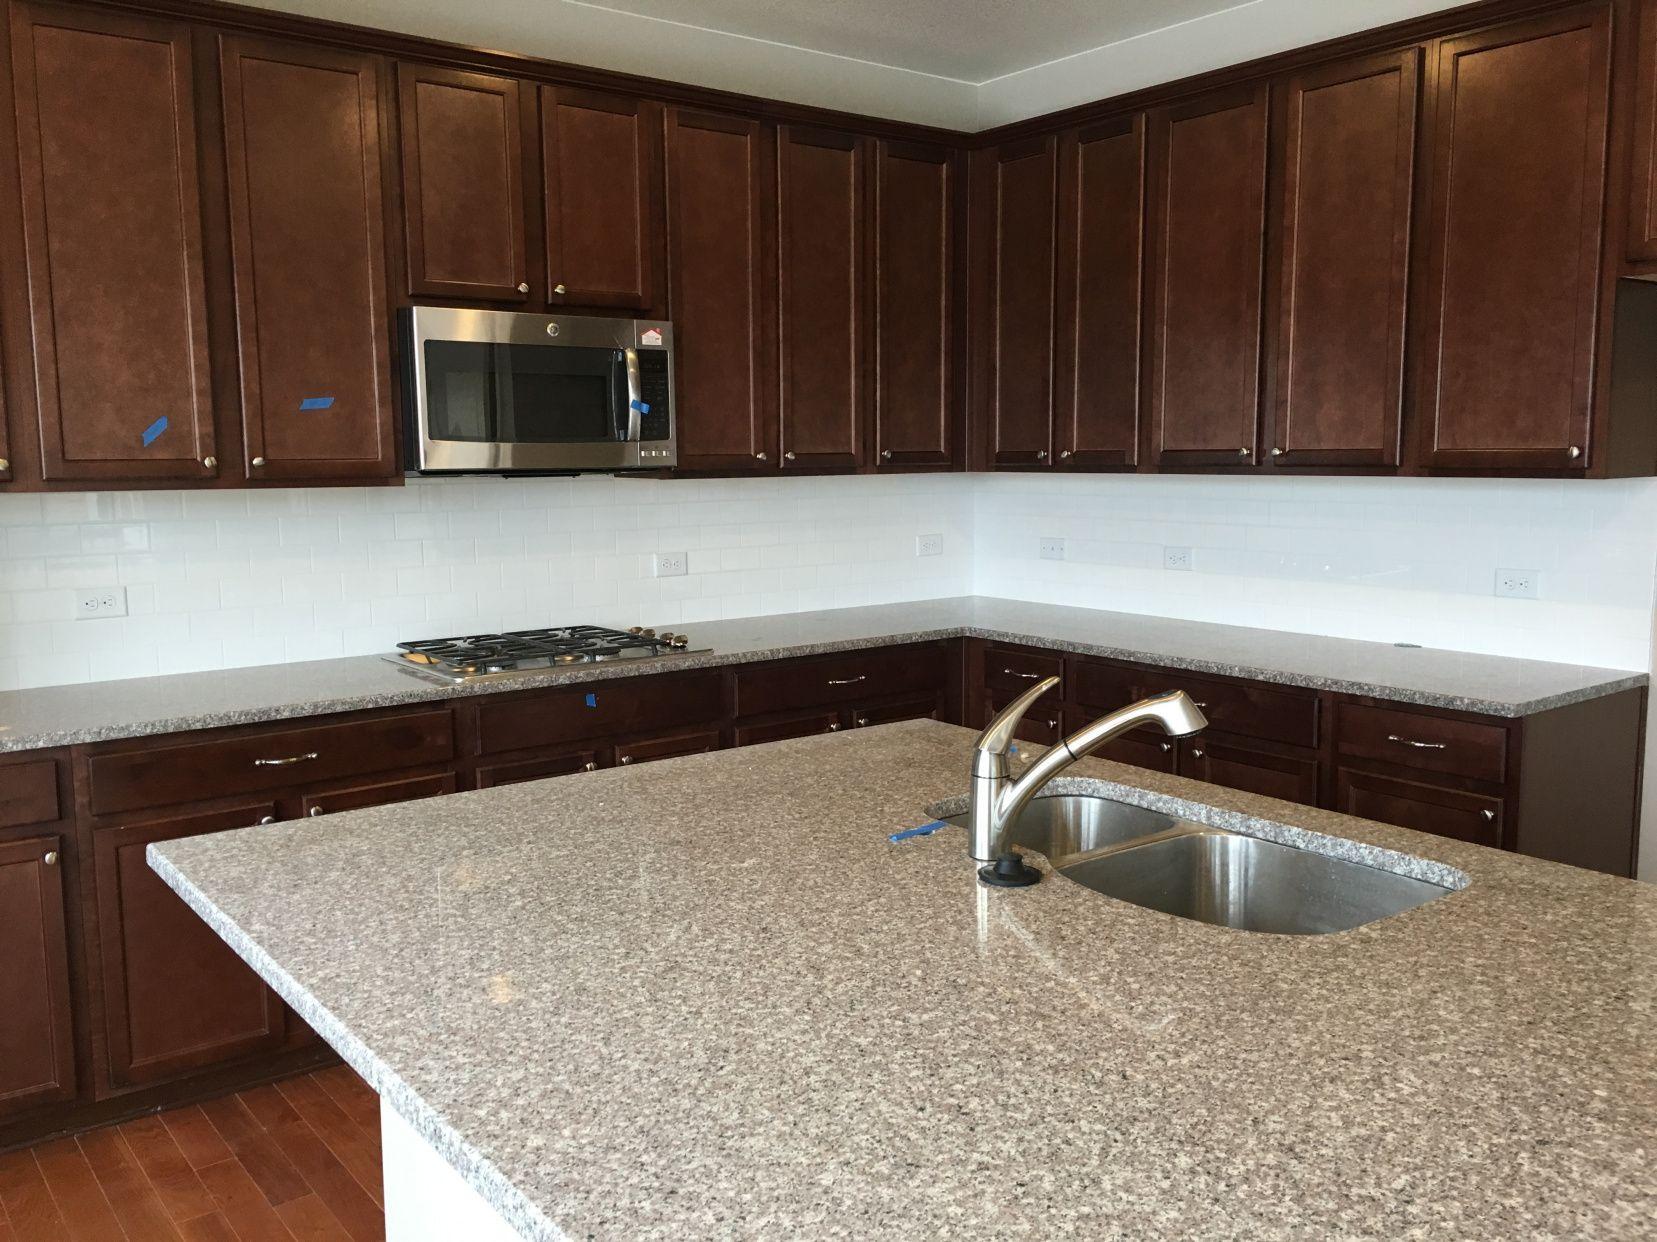 20+ Bainbrook Brown Granite Countertop  Kitchen Design And Layout